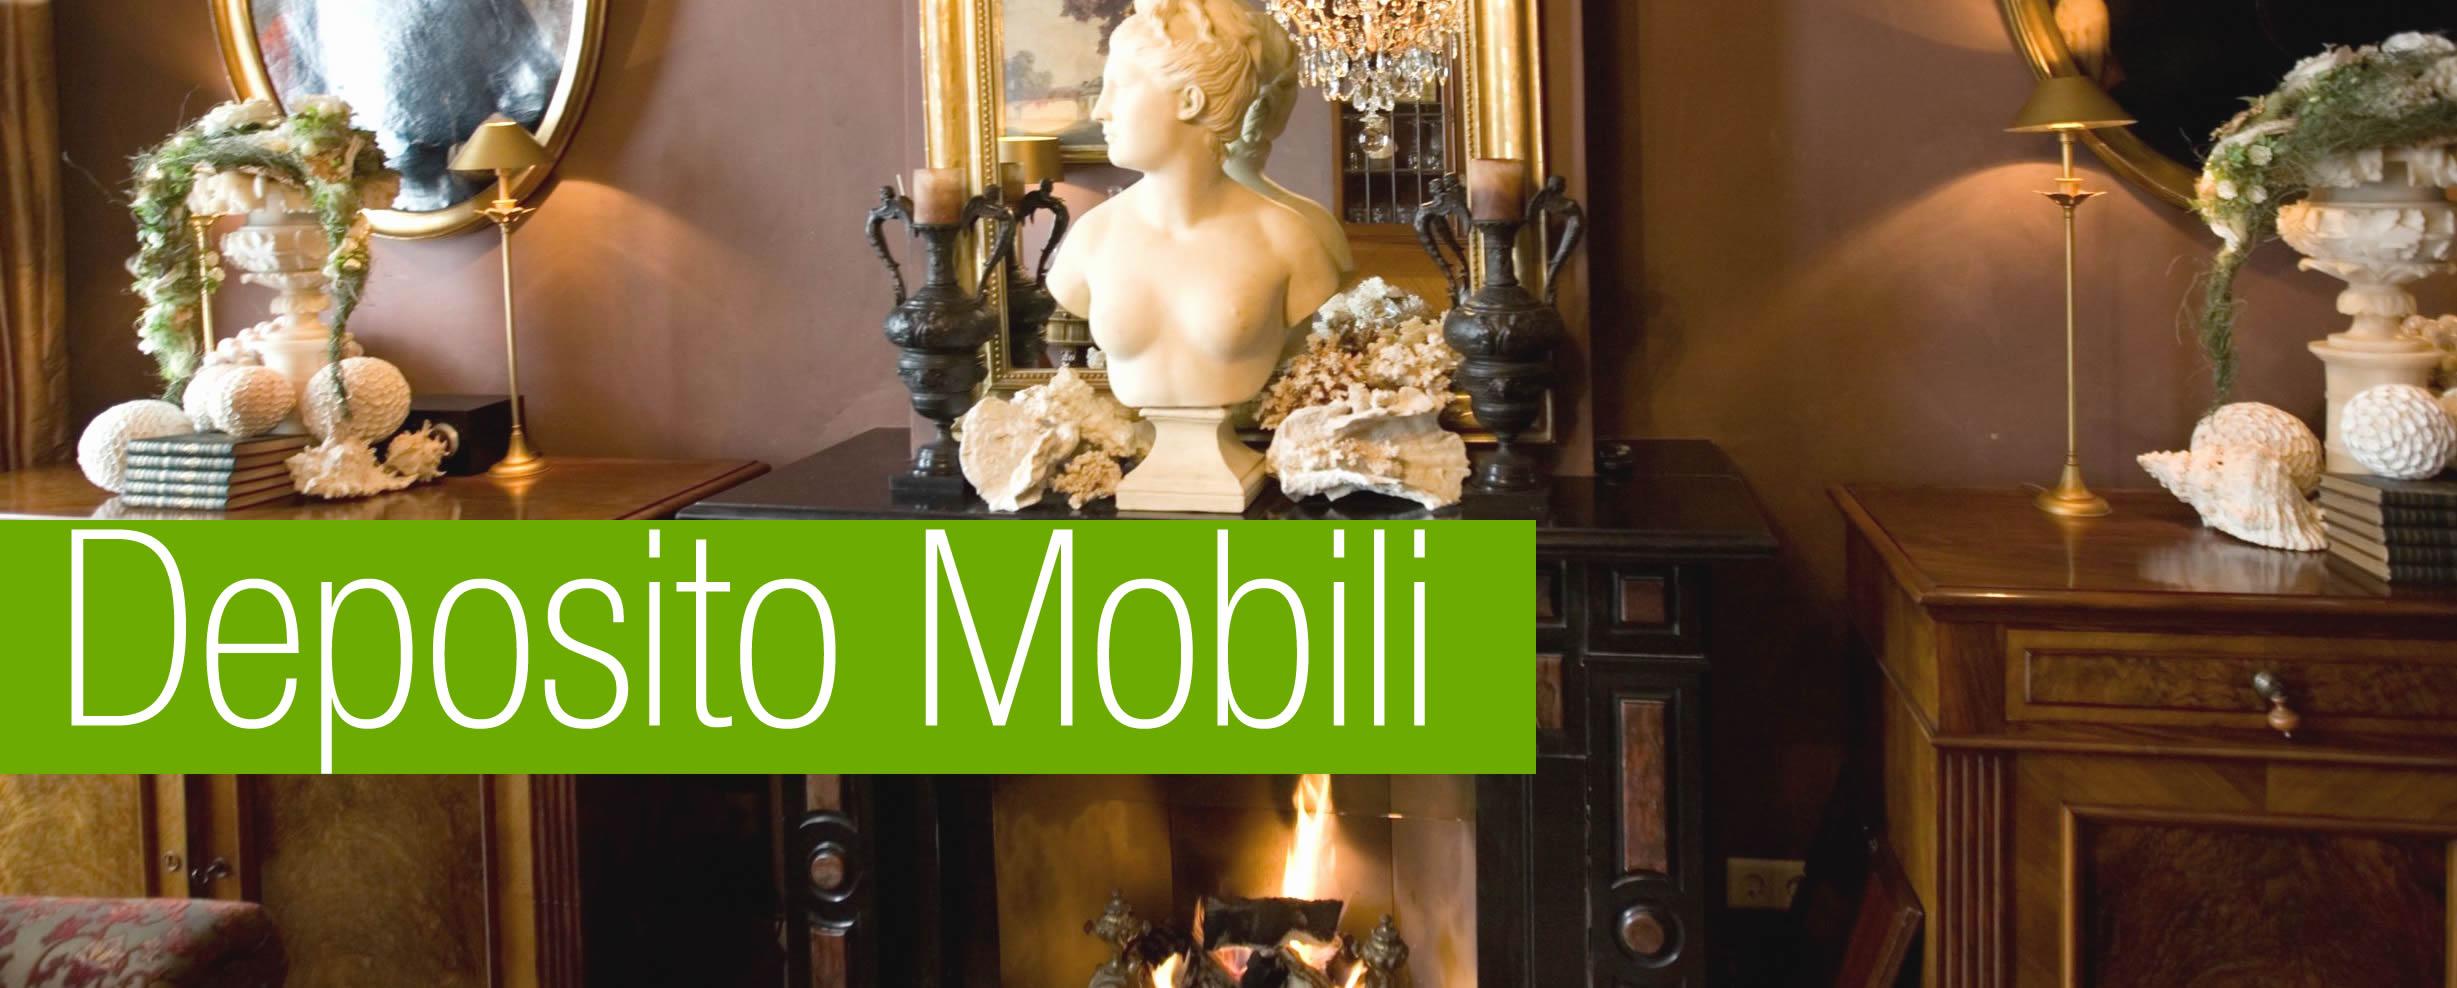 Castel Gandolfo - Imballaggi per Trasloco - Deposito Mobili a Castel Gandolfo